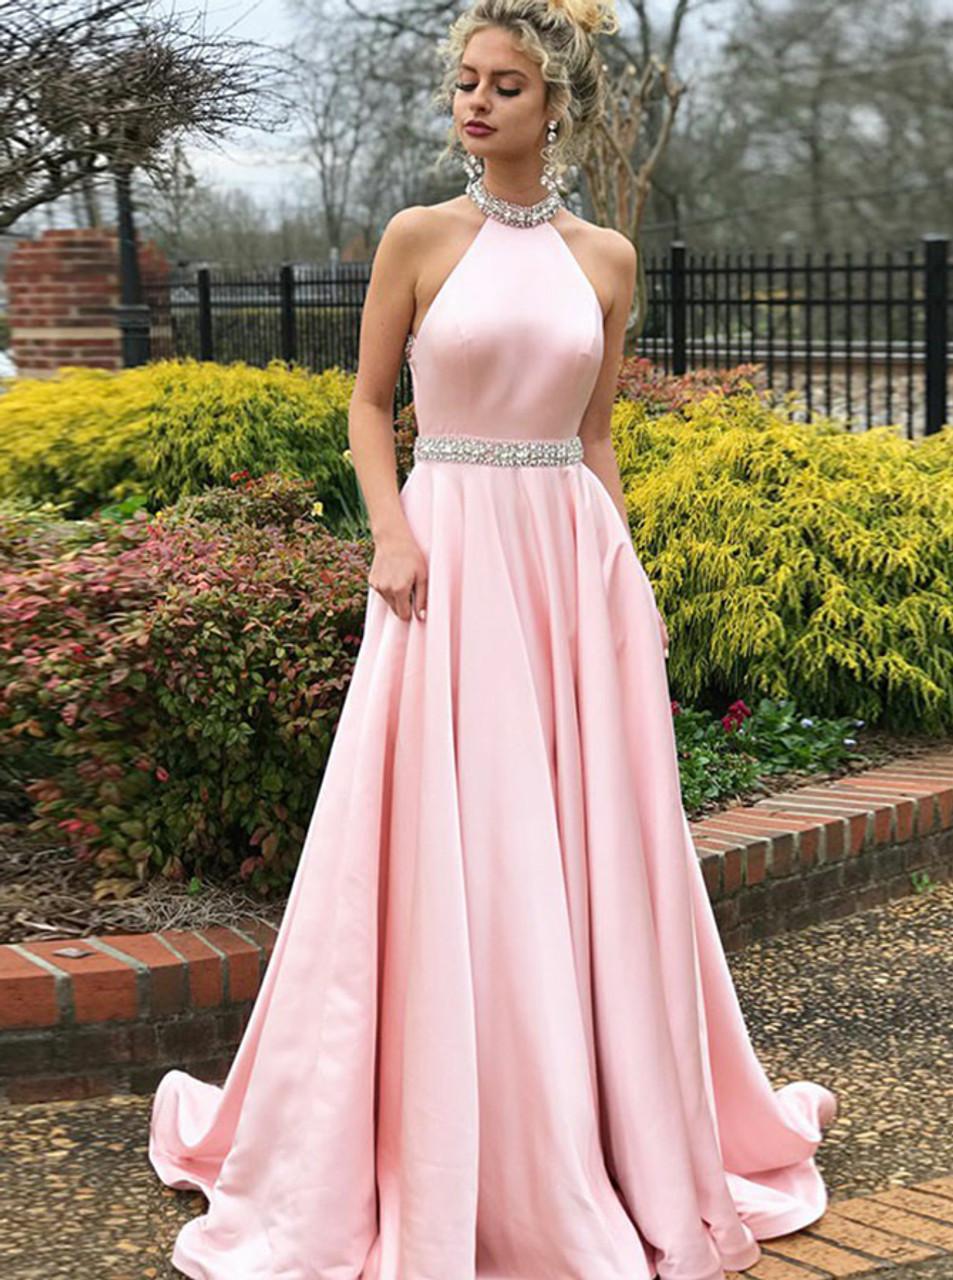 ca6337545 Halter Prom Dress,Backless A-line Evening Dress,11935